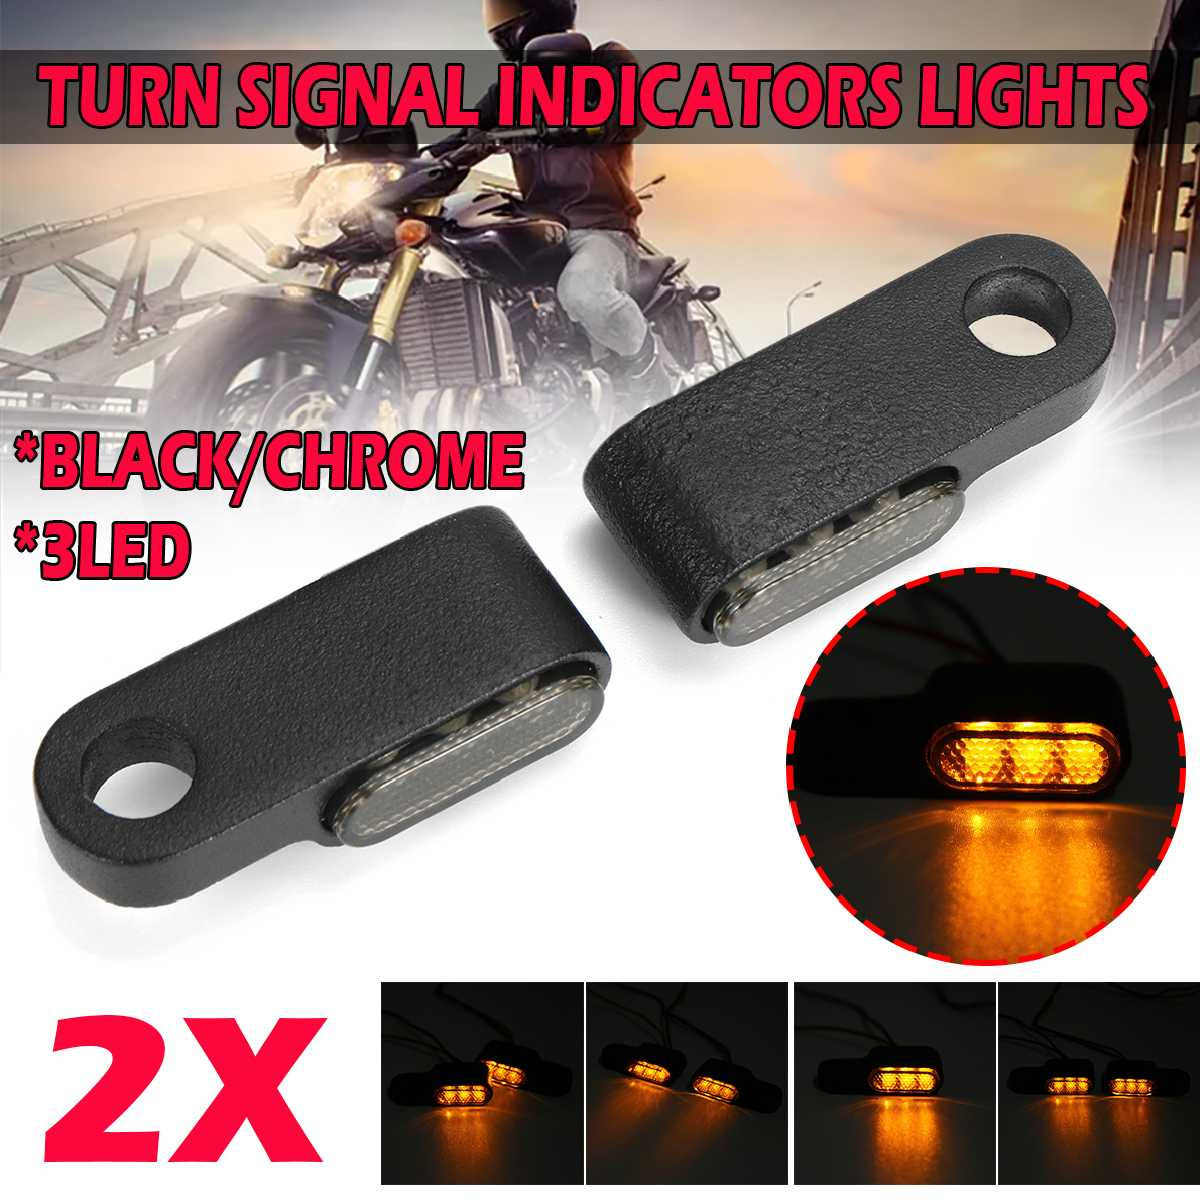 Pair 12V Motorcycle Indicators LED Turn Signal Light Handlebar Amber signal lamp Blinker Aluminum Alloy Black Chorme